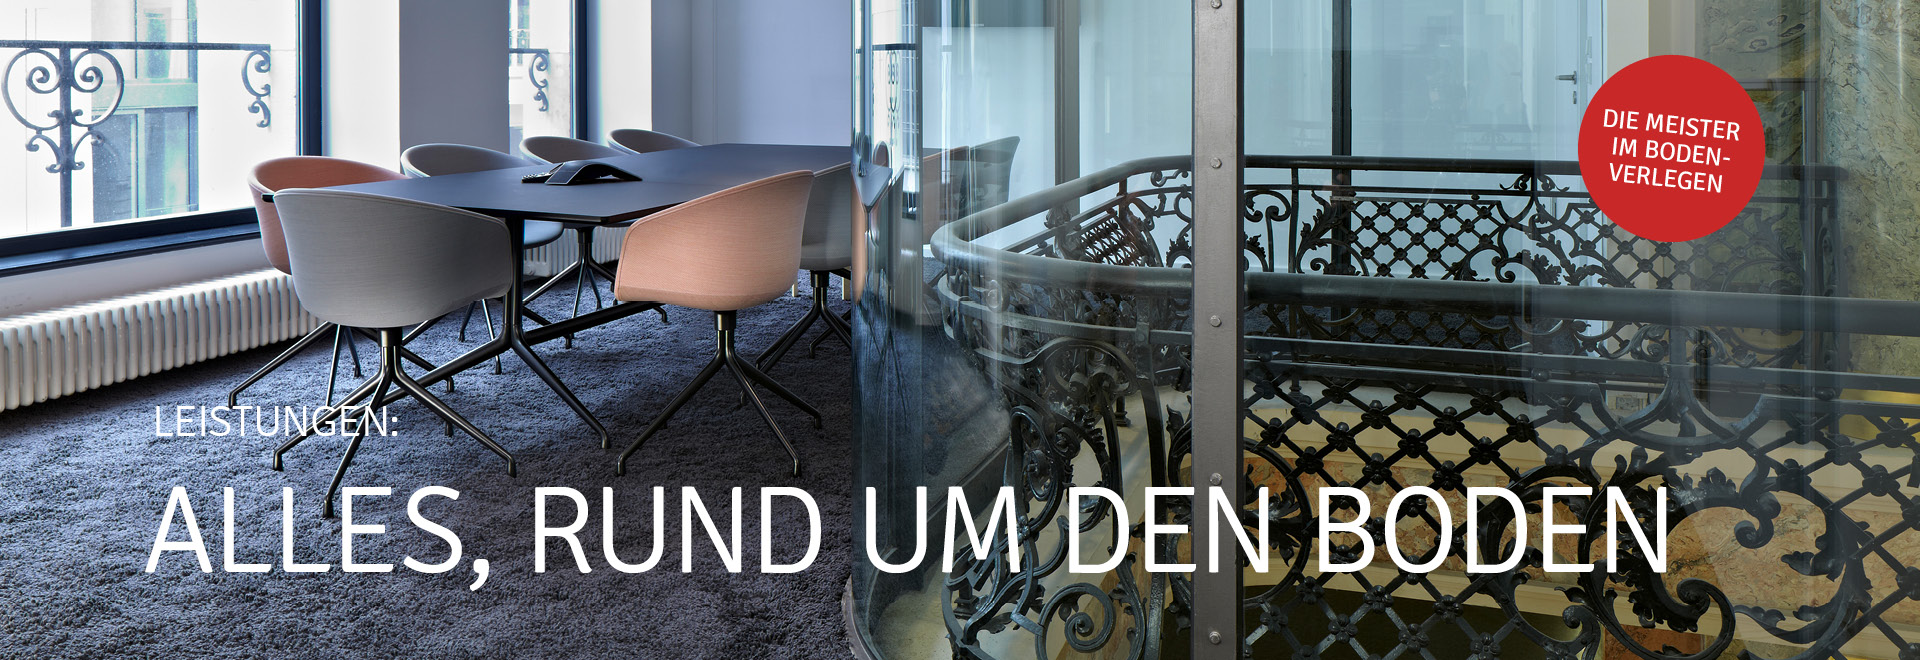 schmid bodenbel ge gmbh leistungen. Black Bedroom Furniture Sets. Home Design Ideas